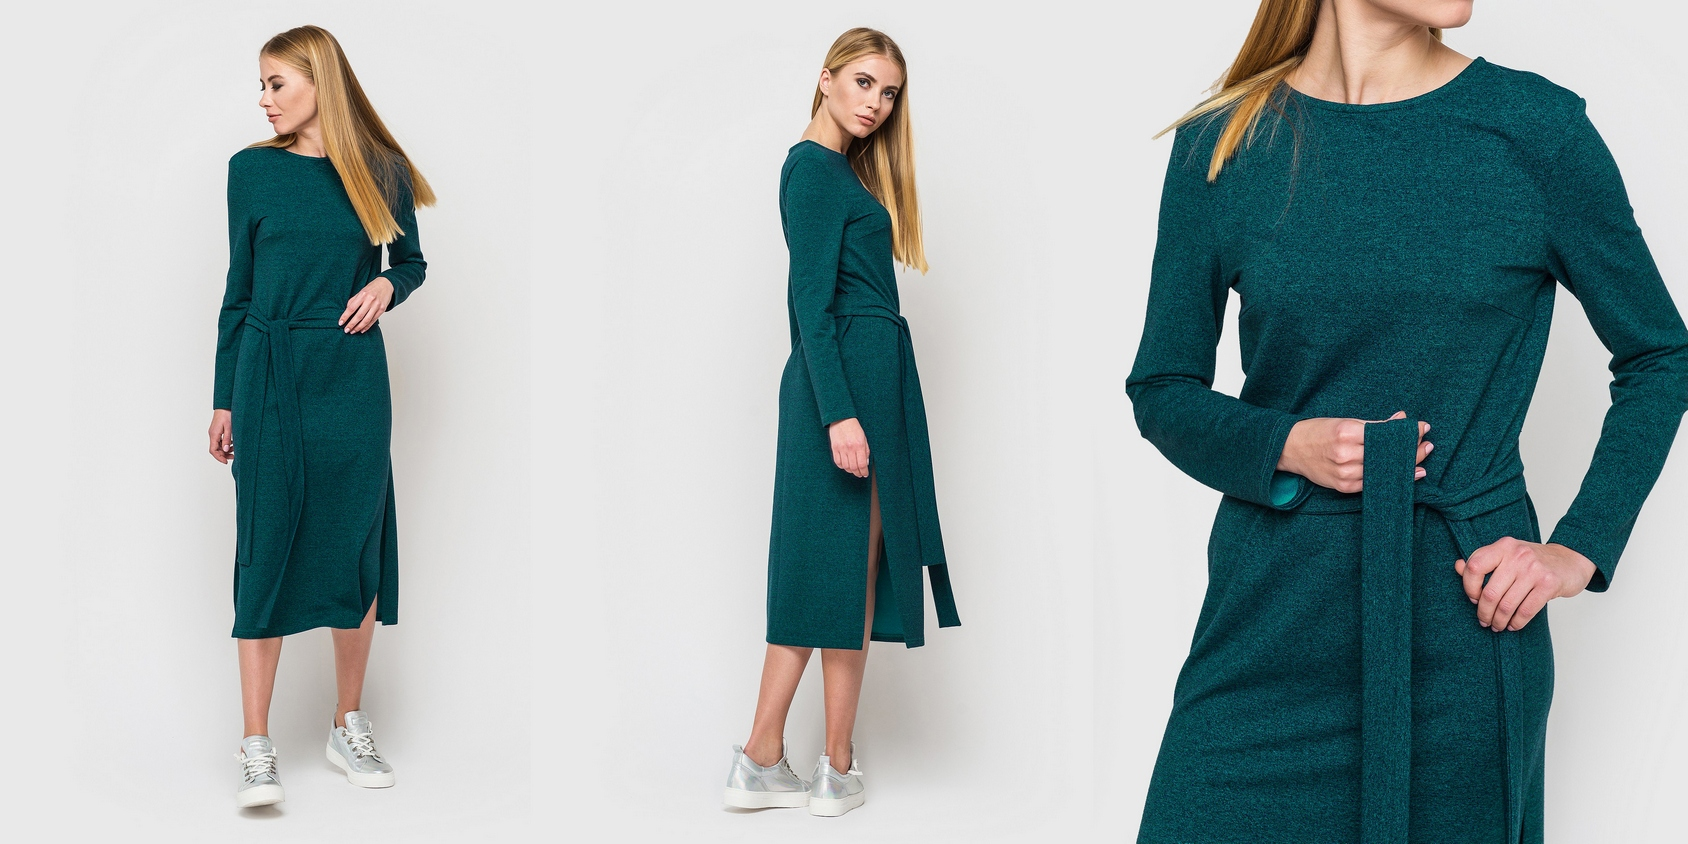 vovk_jersey_dress_3